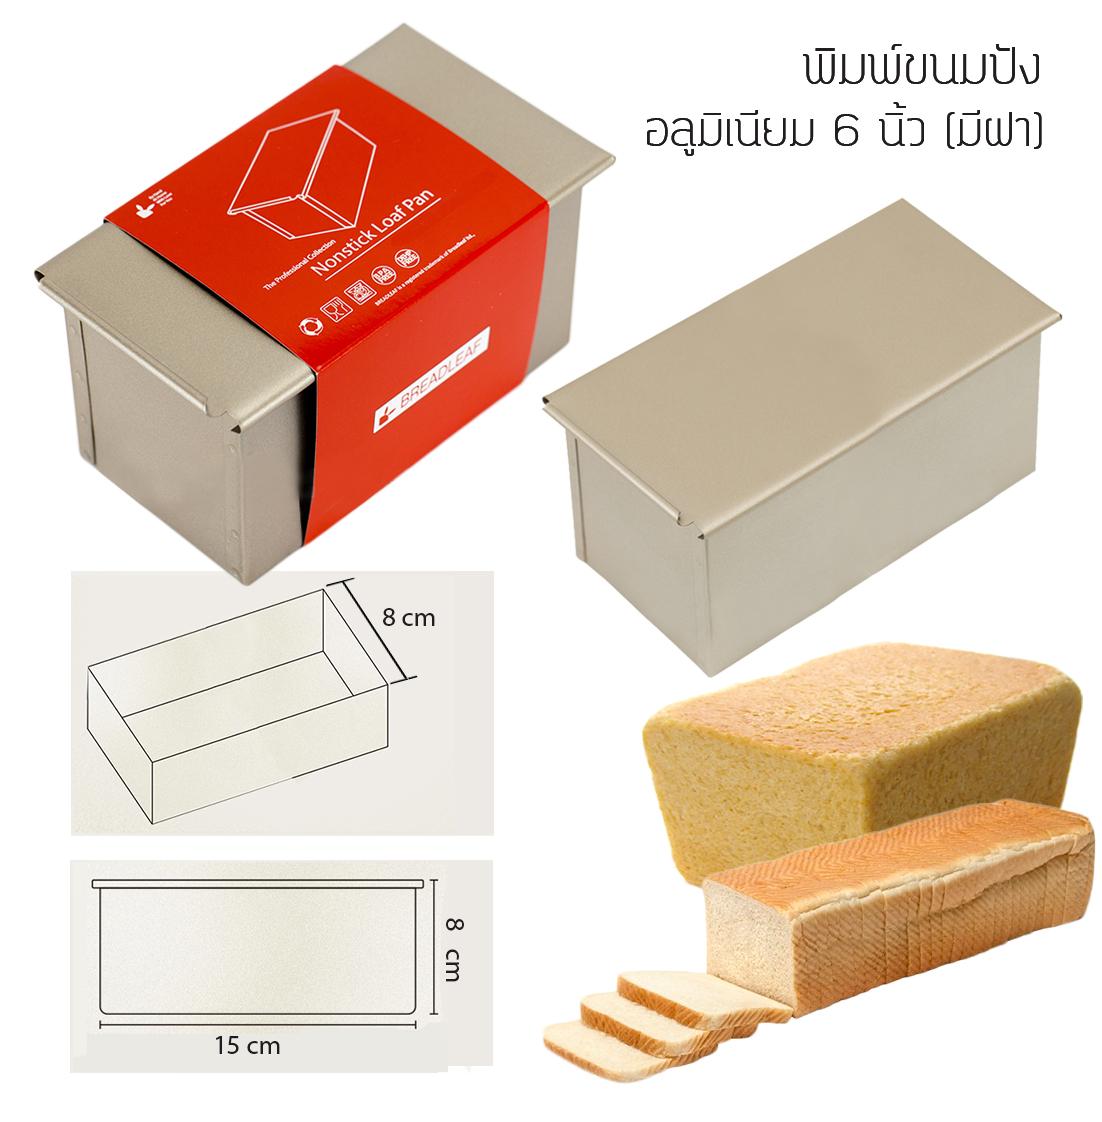 Breadleaf Non Stick Loaf Pan พิมพ์อบขนมปัง+ฝา 15x8x8cm